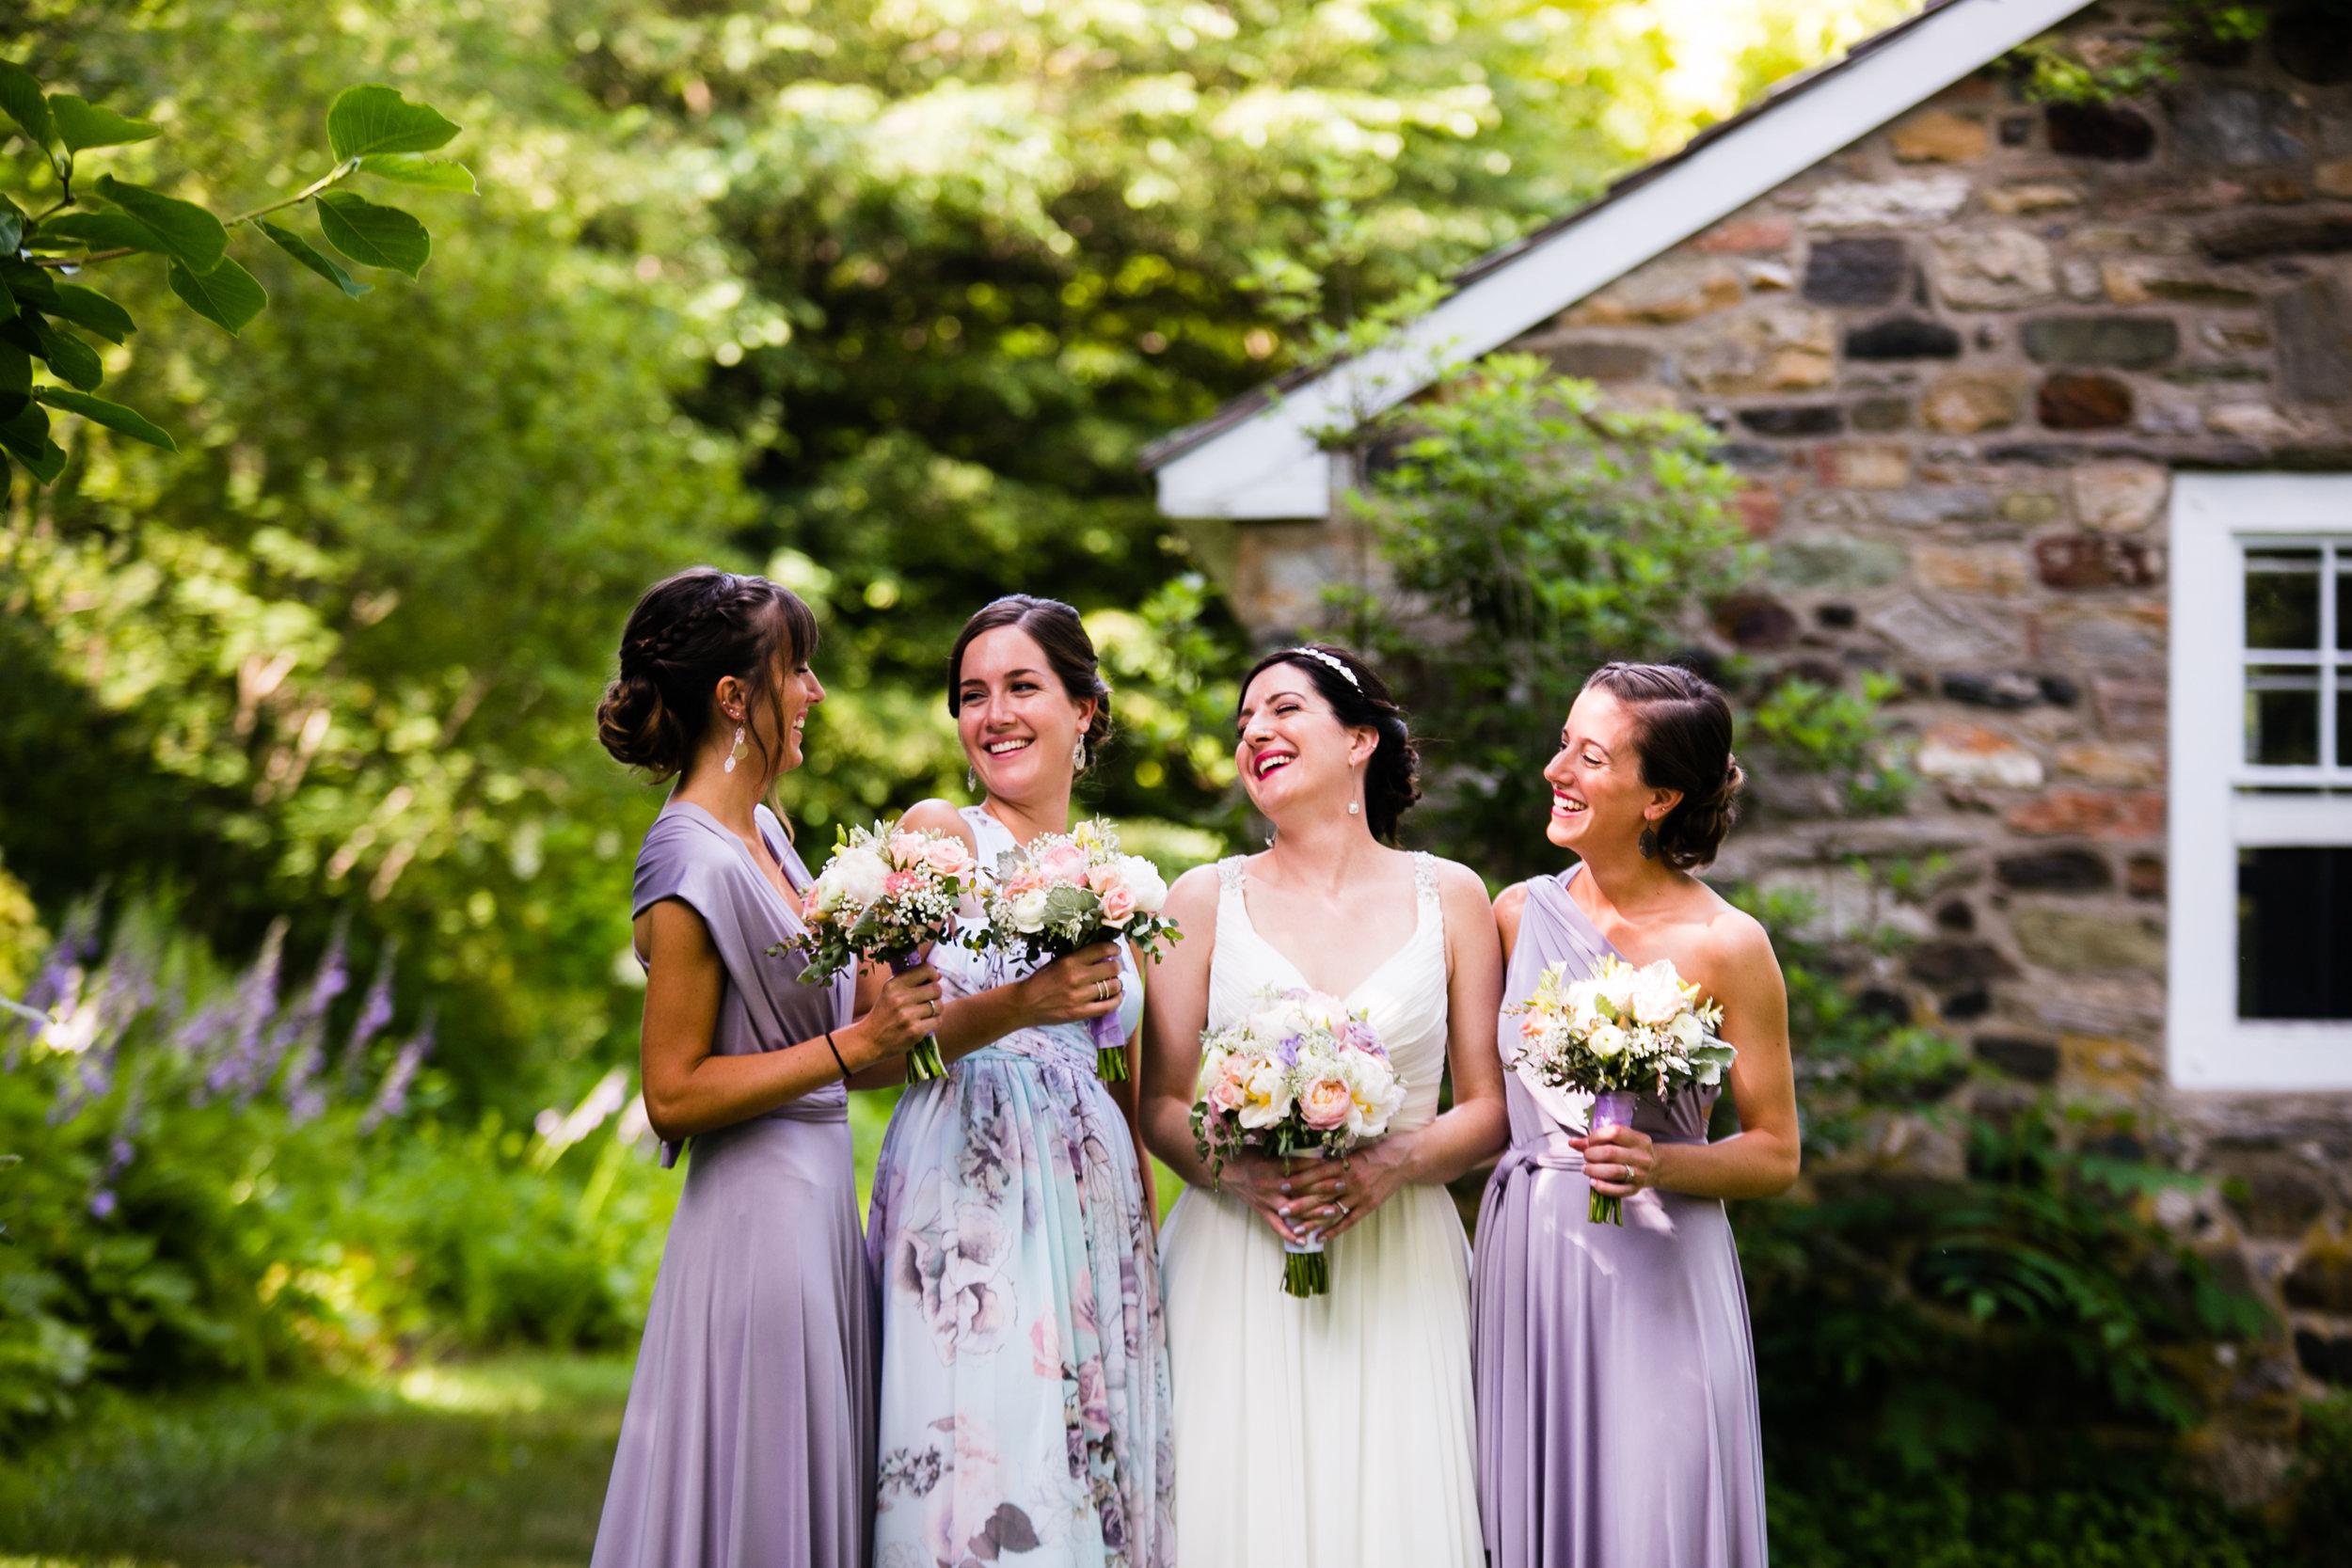 TYLER ARBORETUM WEDDING PHOTOGRAPHY LOVESTRUCK PICTURES-022.jpg